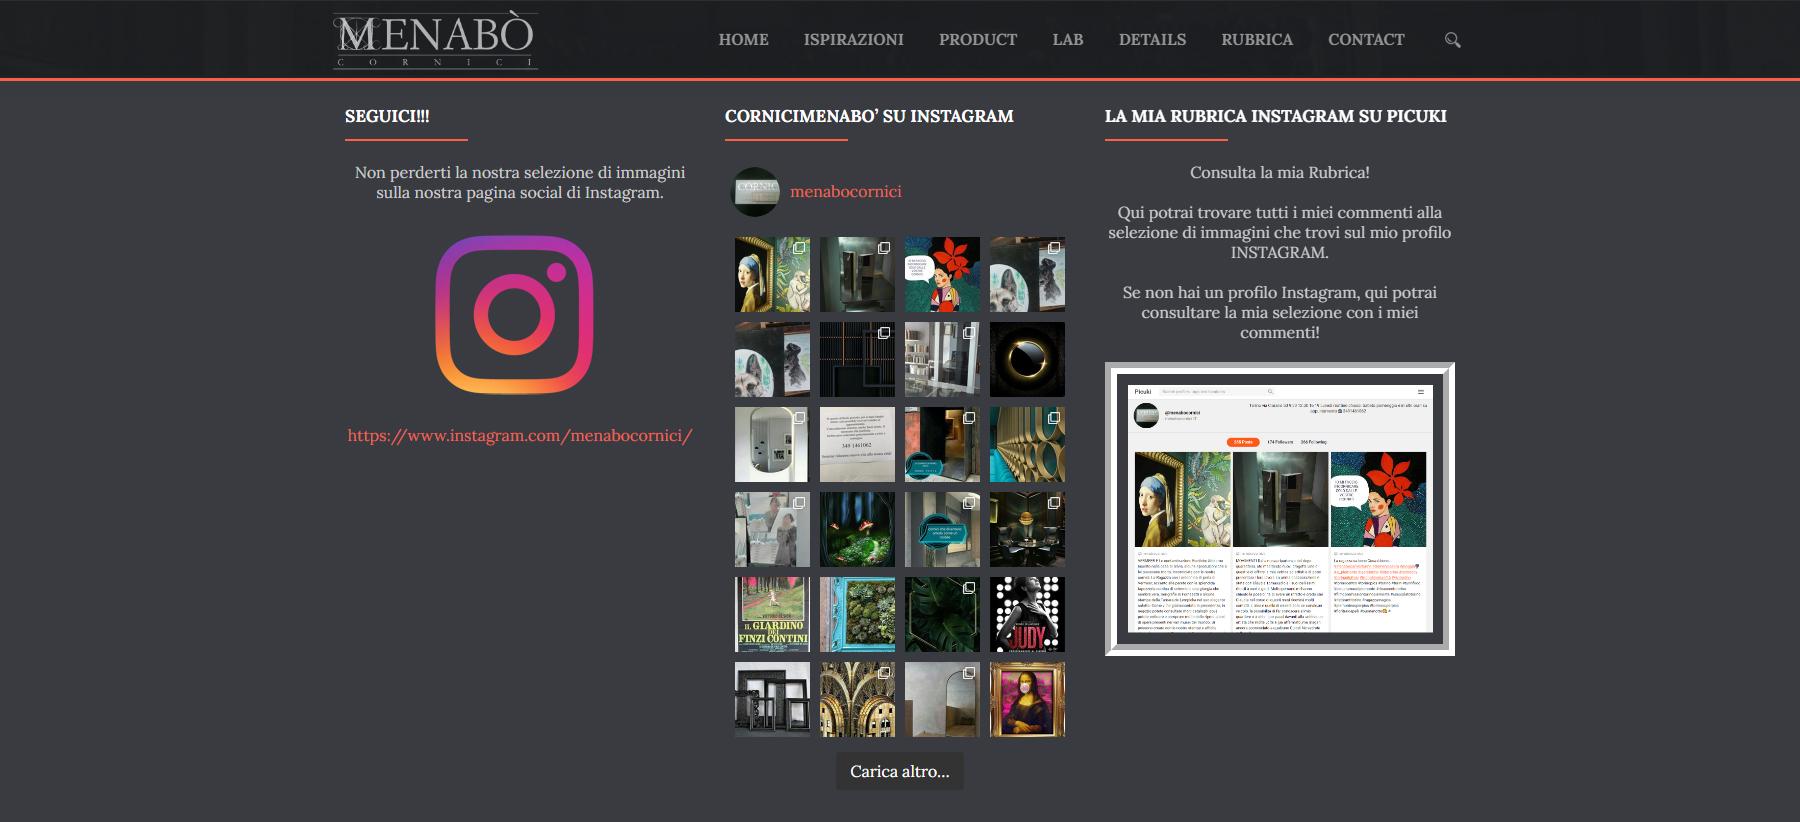 cornicimenabo'__instagram__cornici-menabo'__